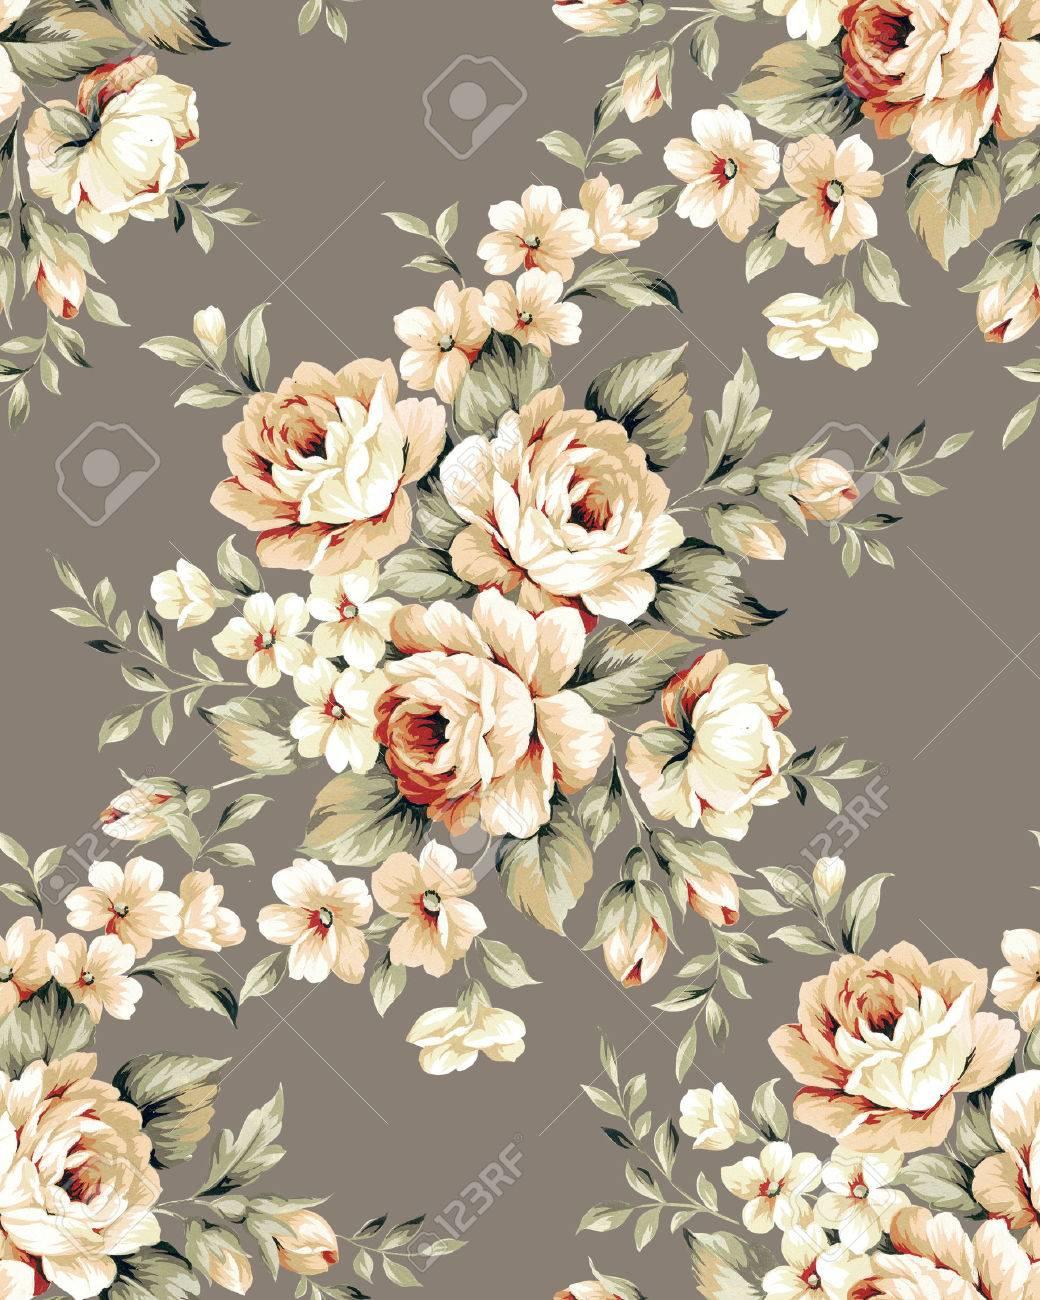 Fresh spring flowers seamless pattern - For easy making seamless pattern use it for filling any contours - 72285625